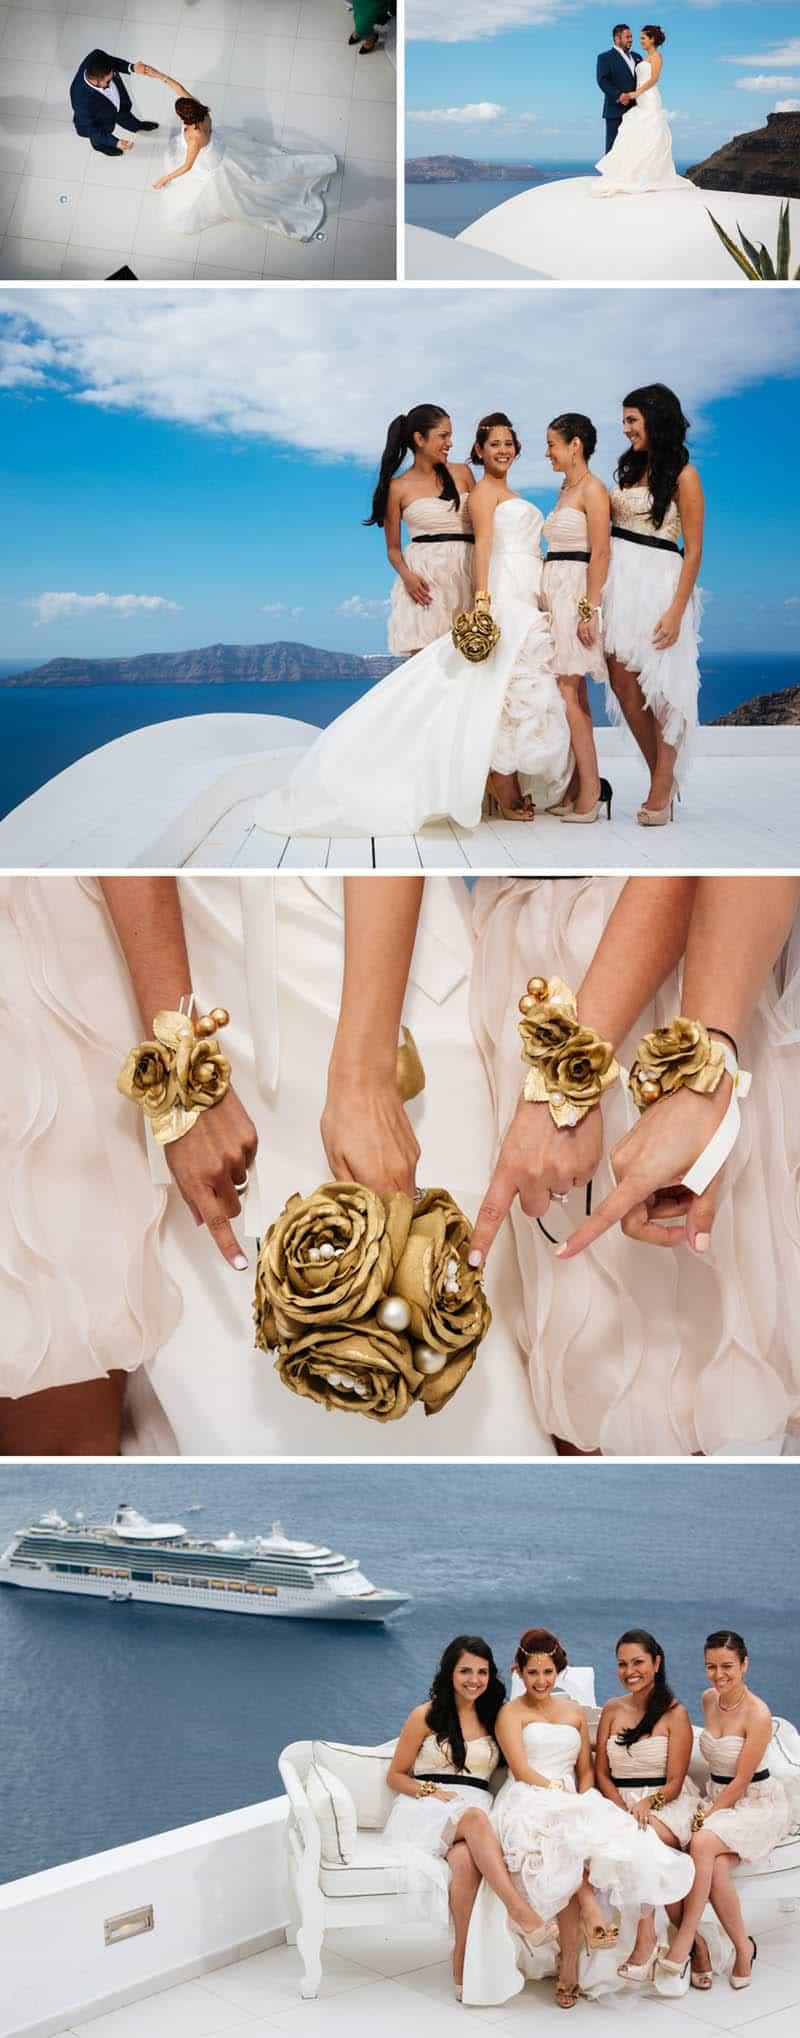 A Travel Themed Destination Wedding in Santorini 6